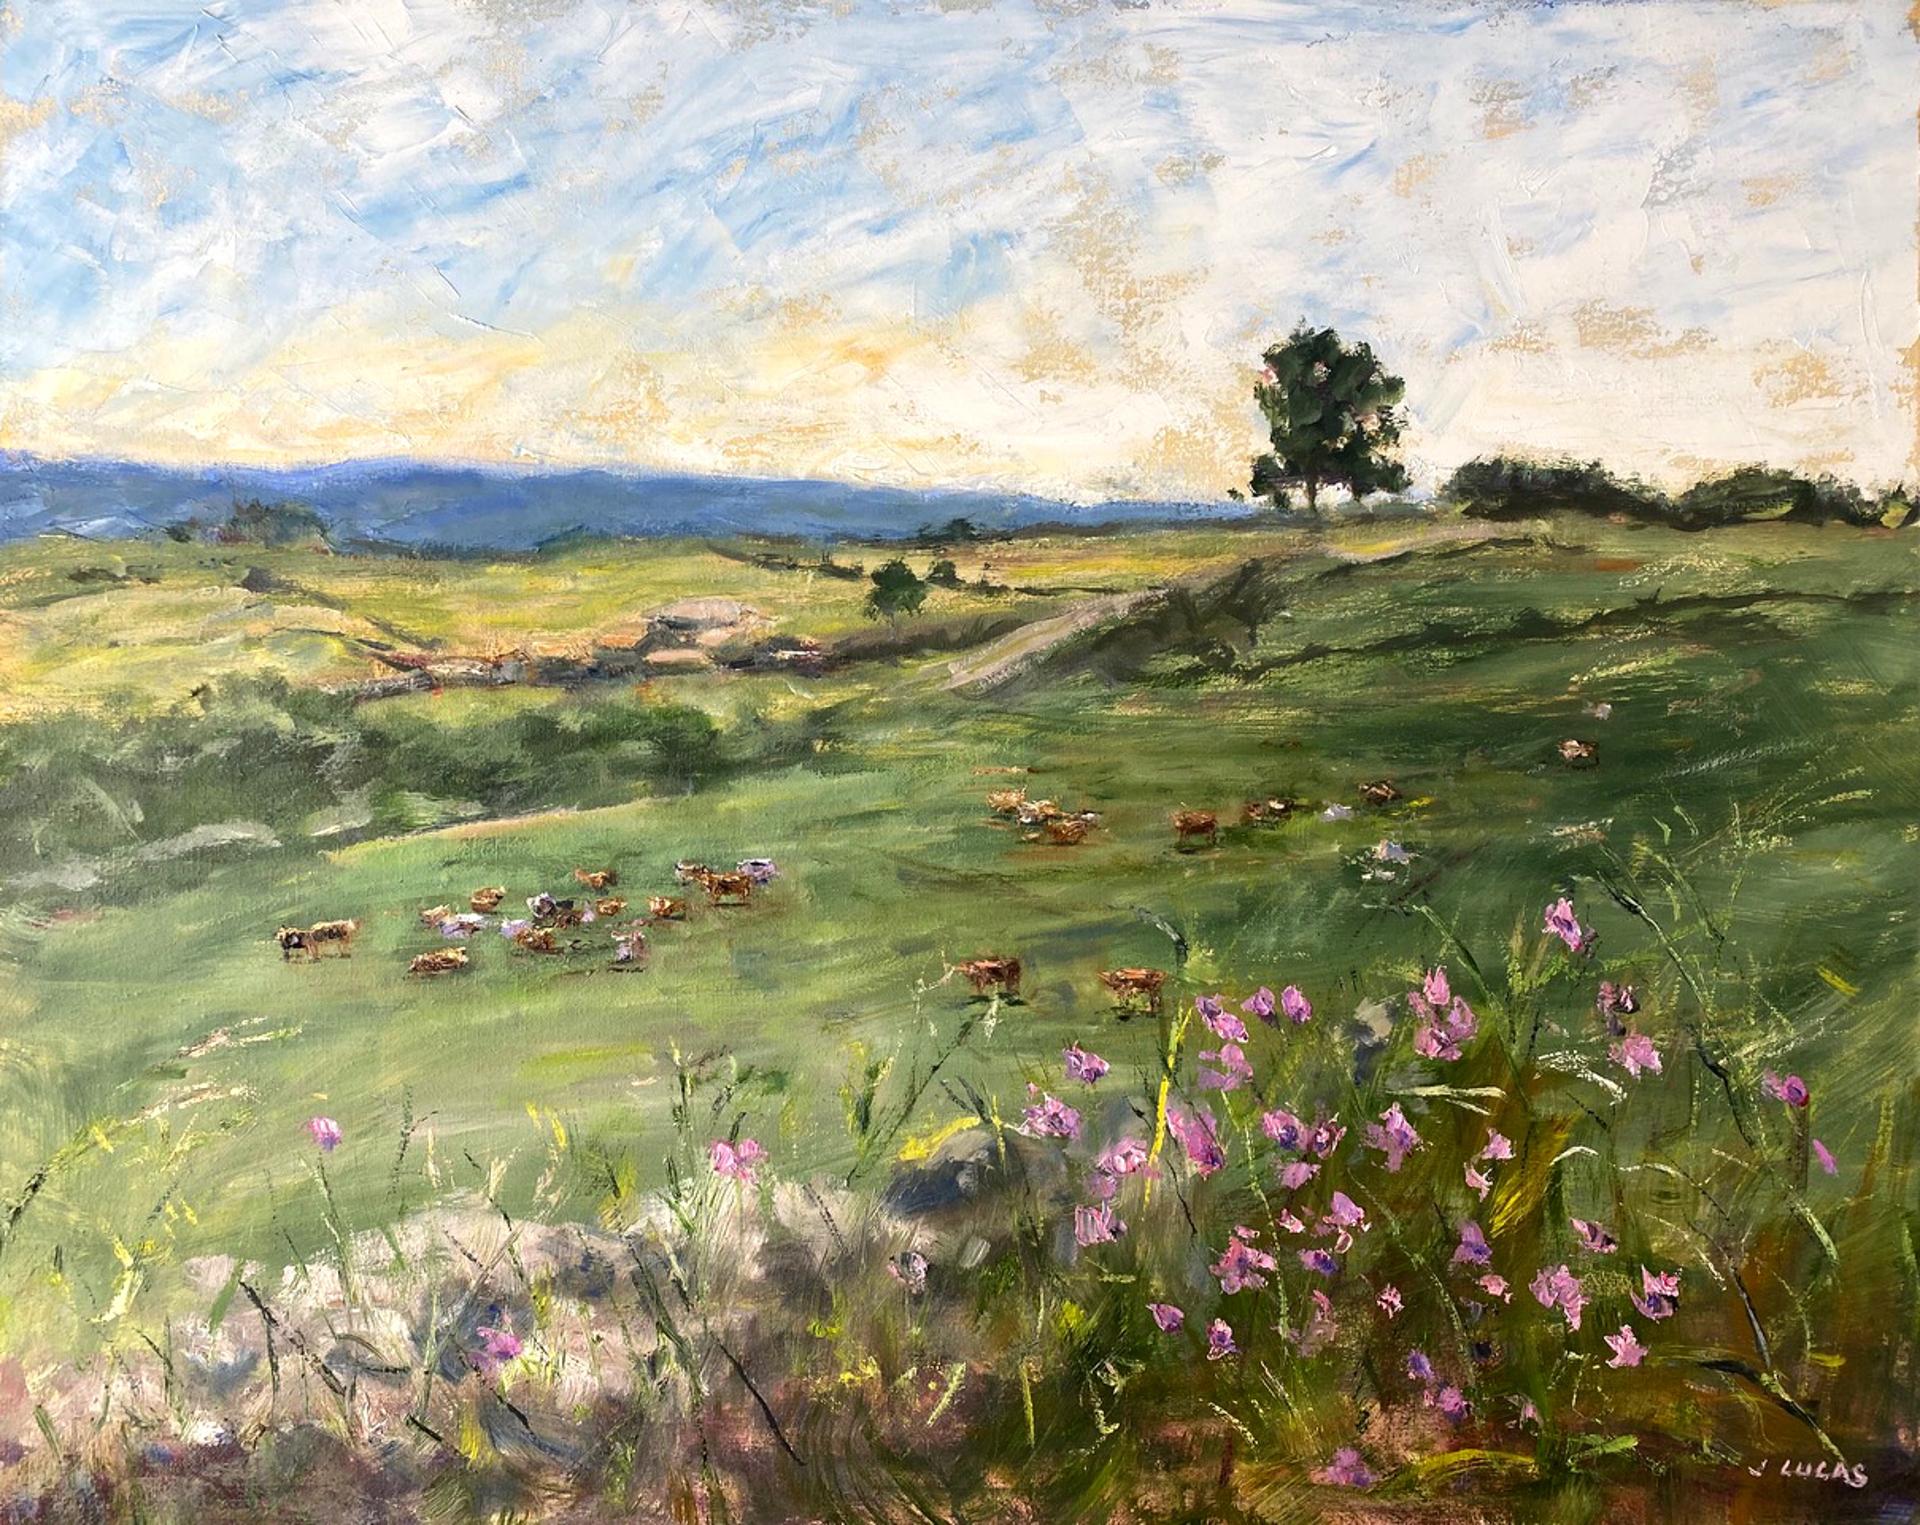 Purple Wildflowers by Janet Lucas Beck